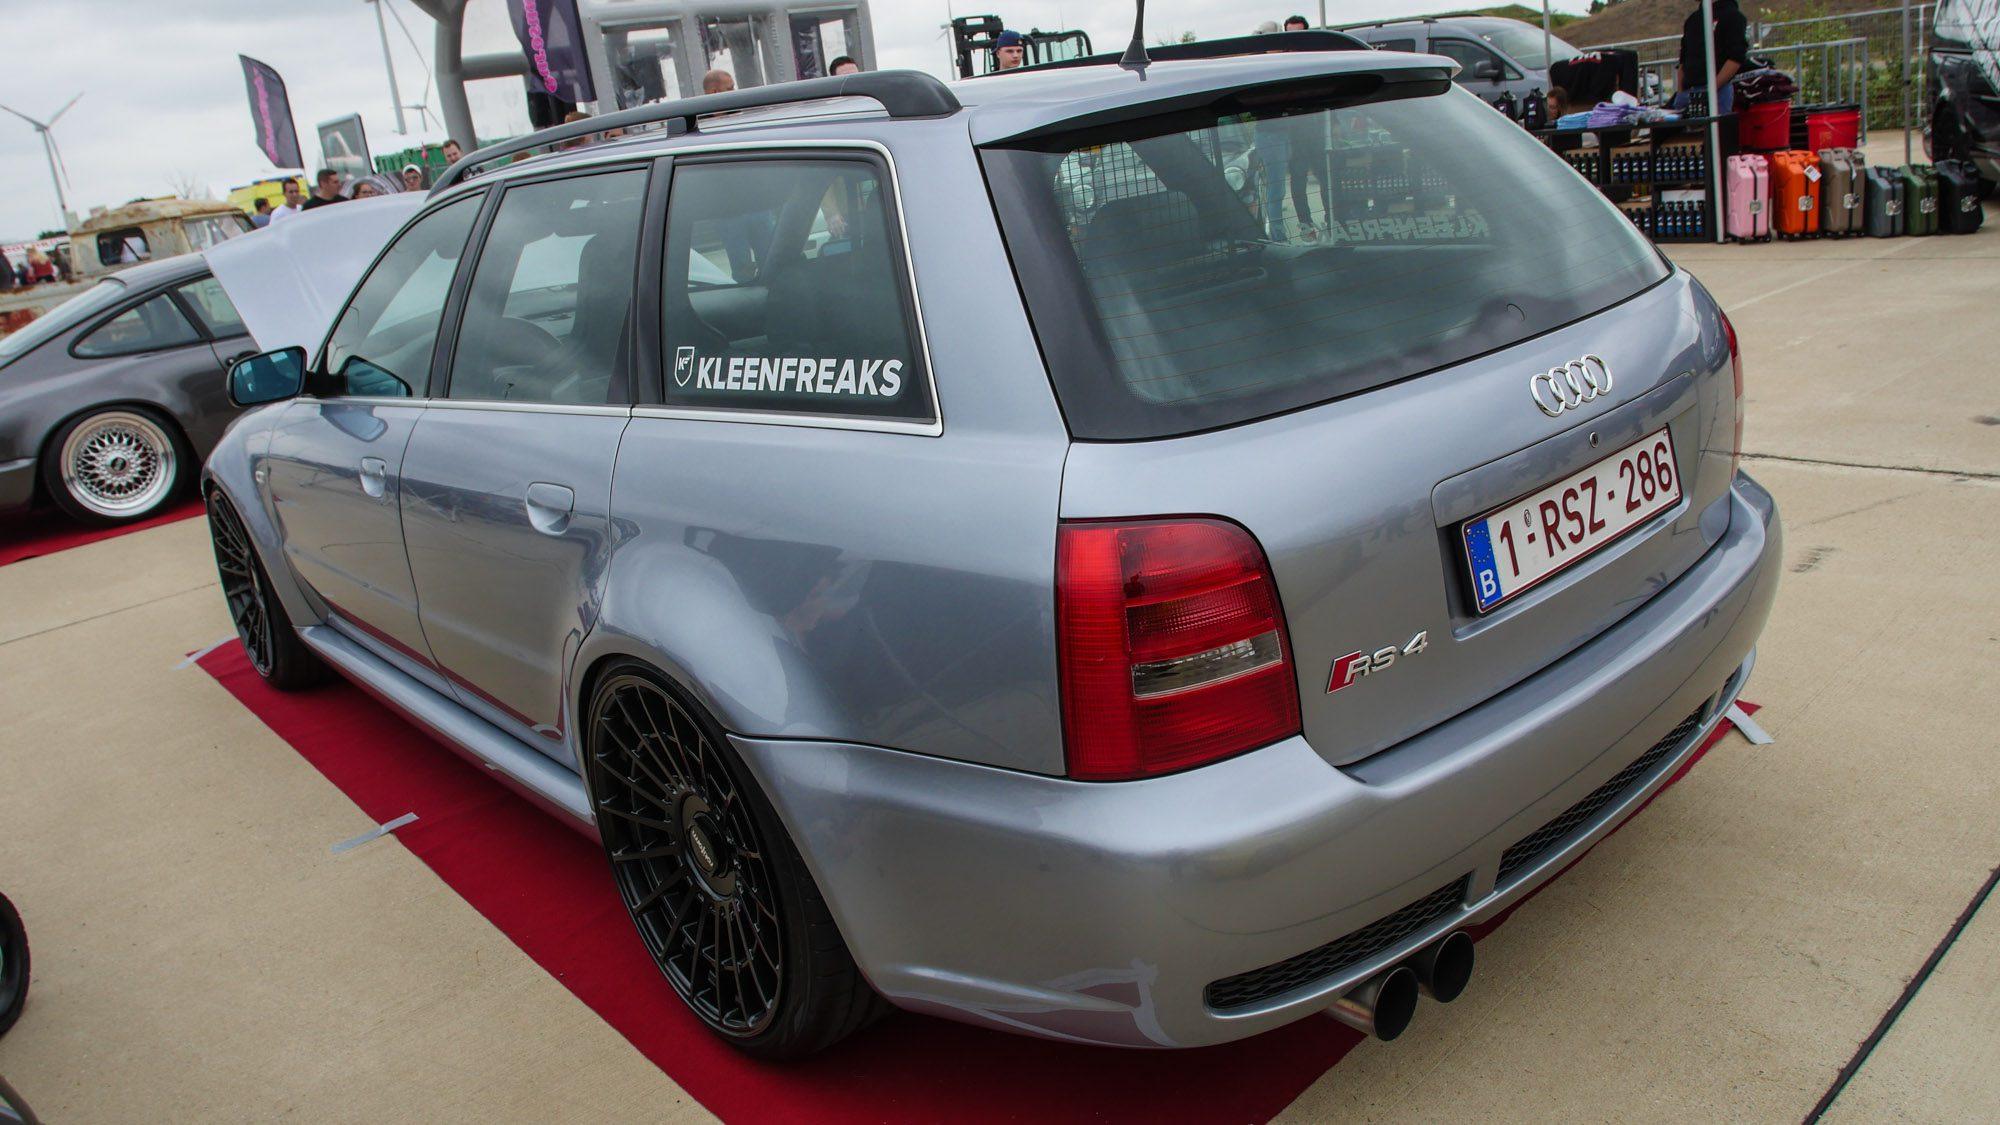 Heckansicht des Audi RS4